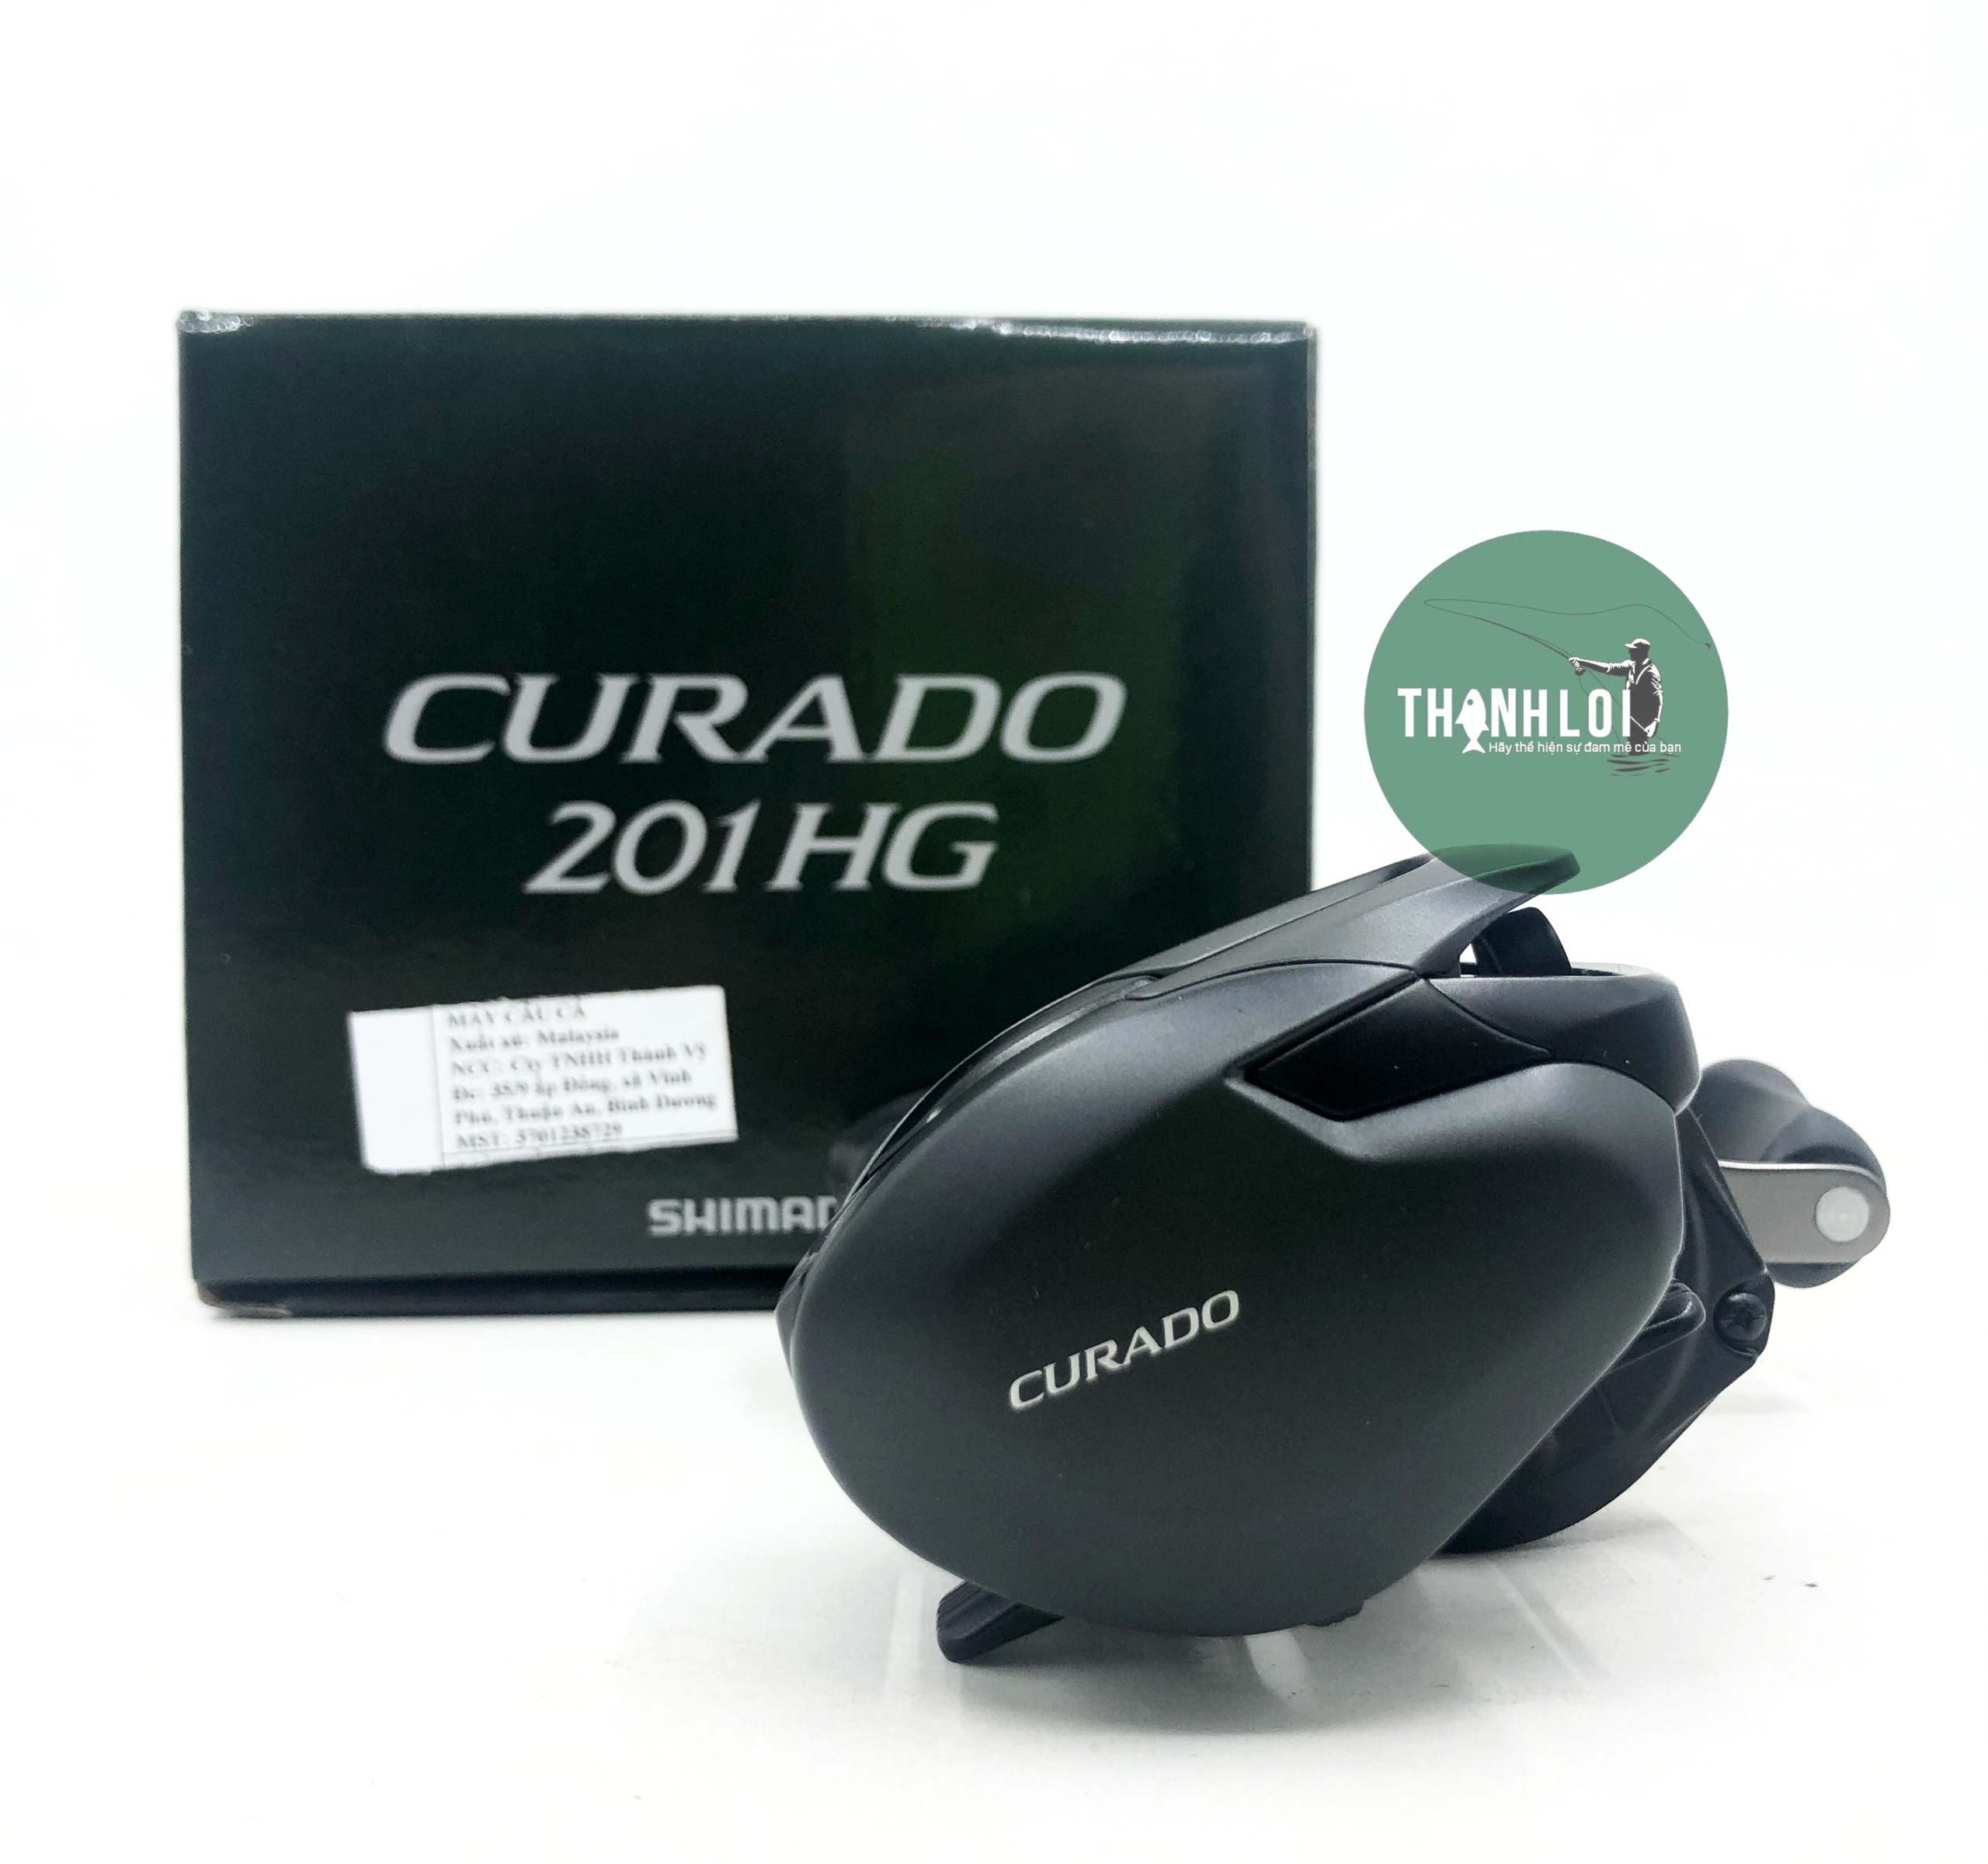 MÁY CURADO 201 _ 200 HG